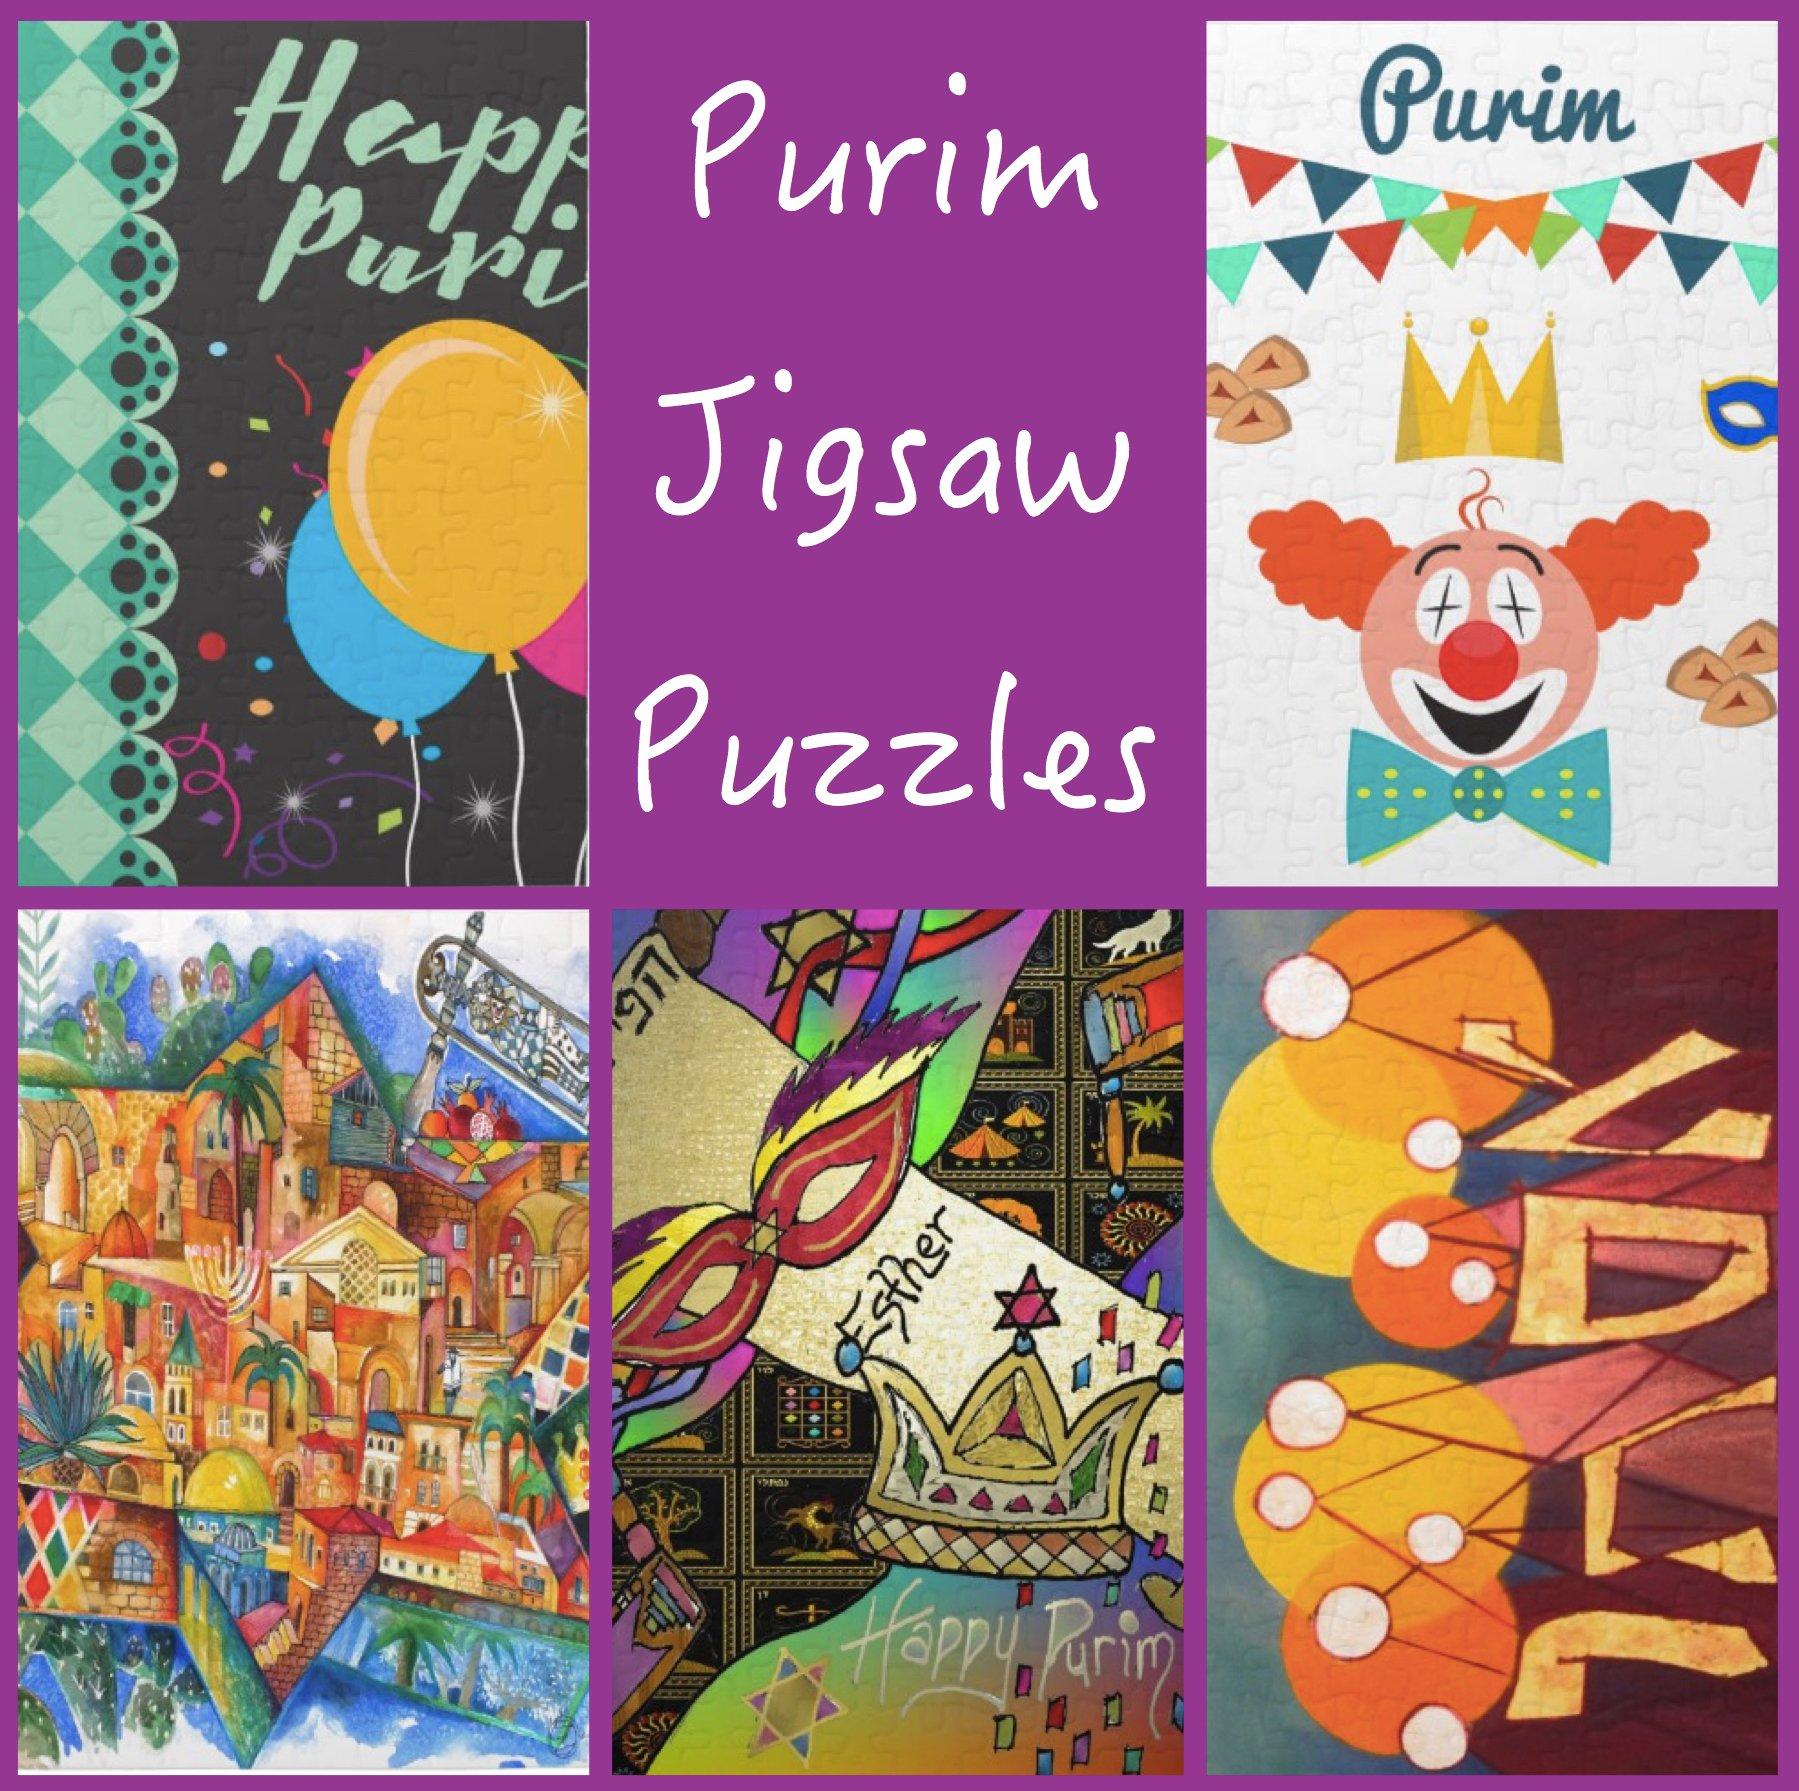 Purim Jigsaw Puzzles